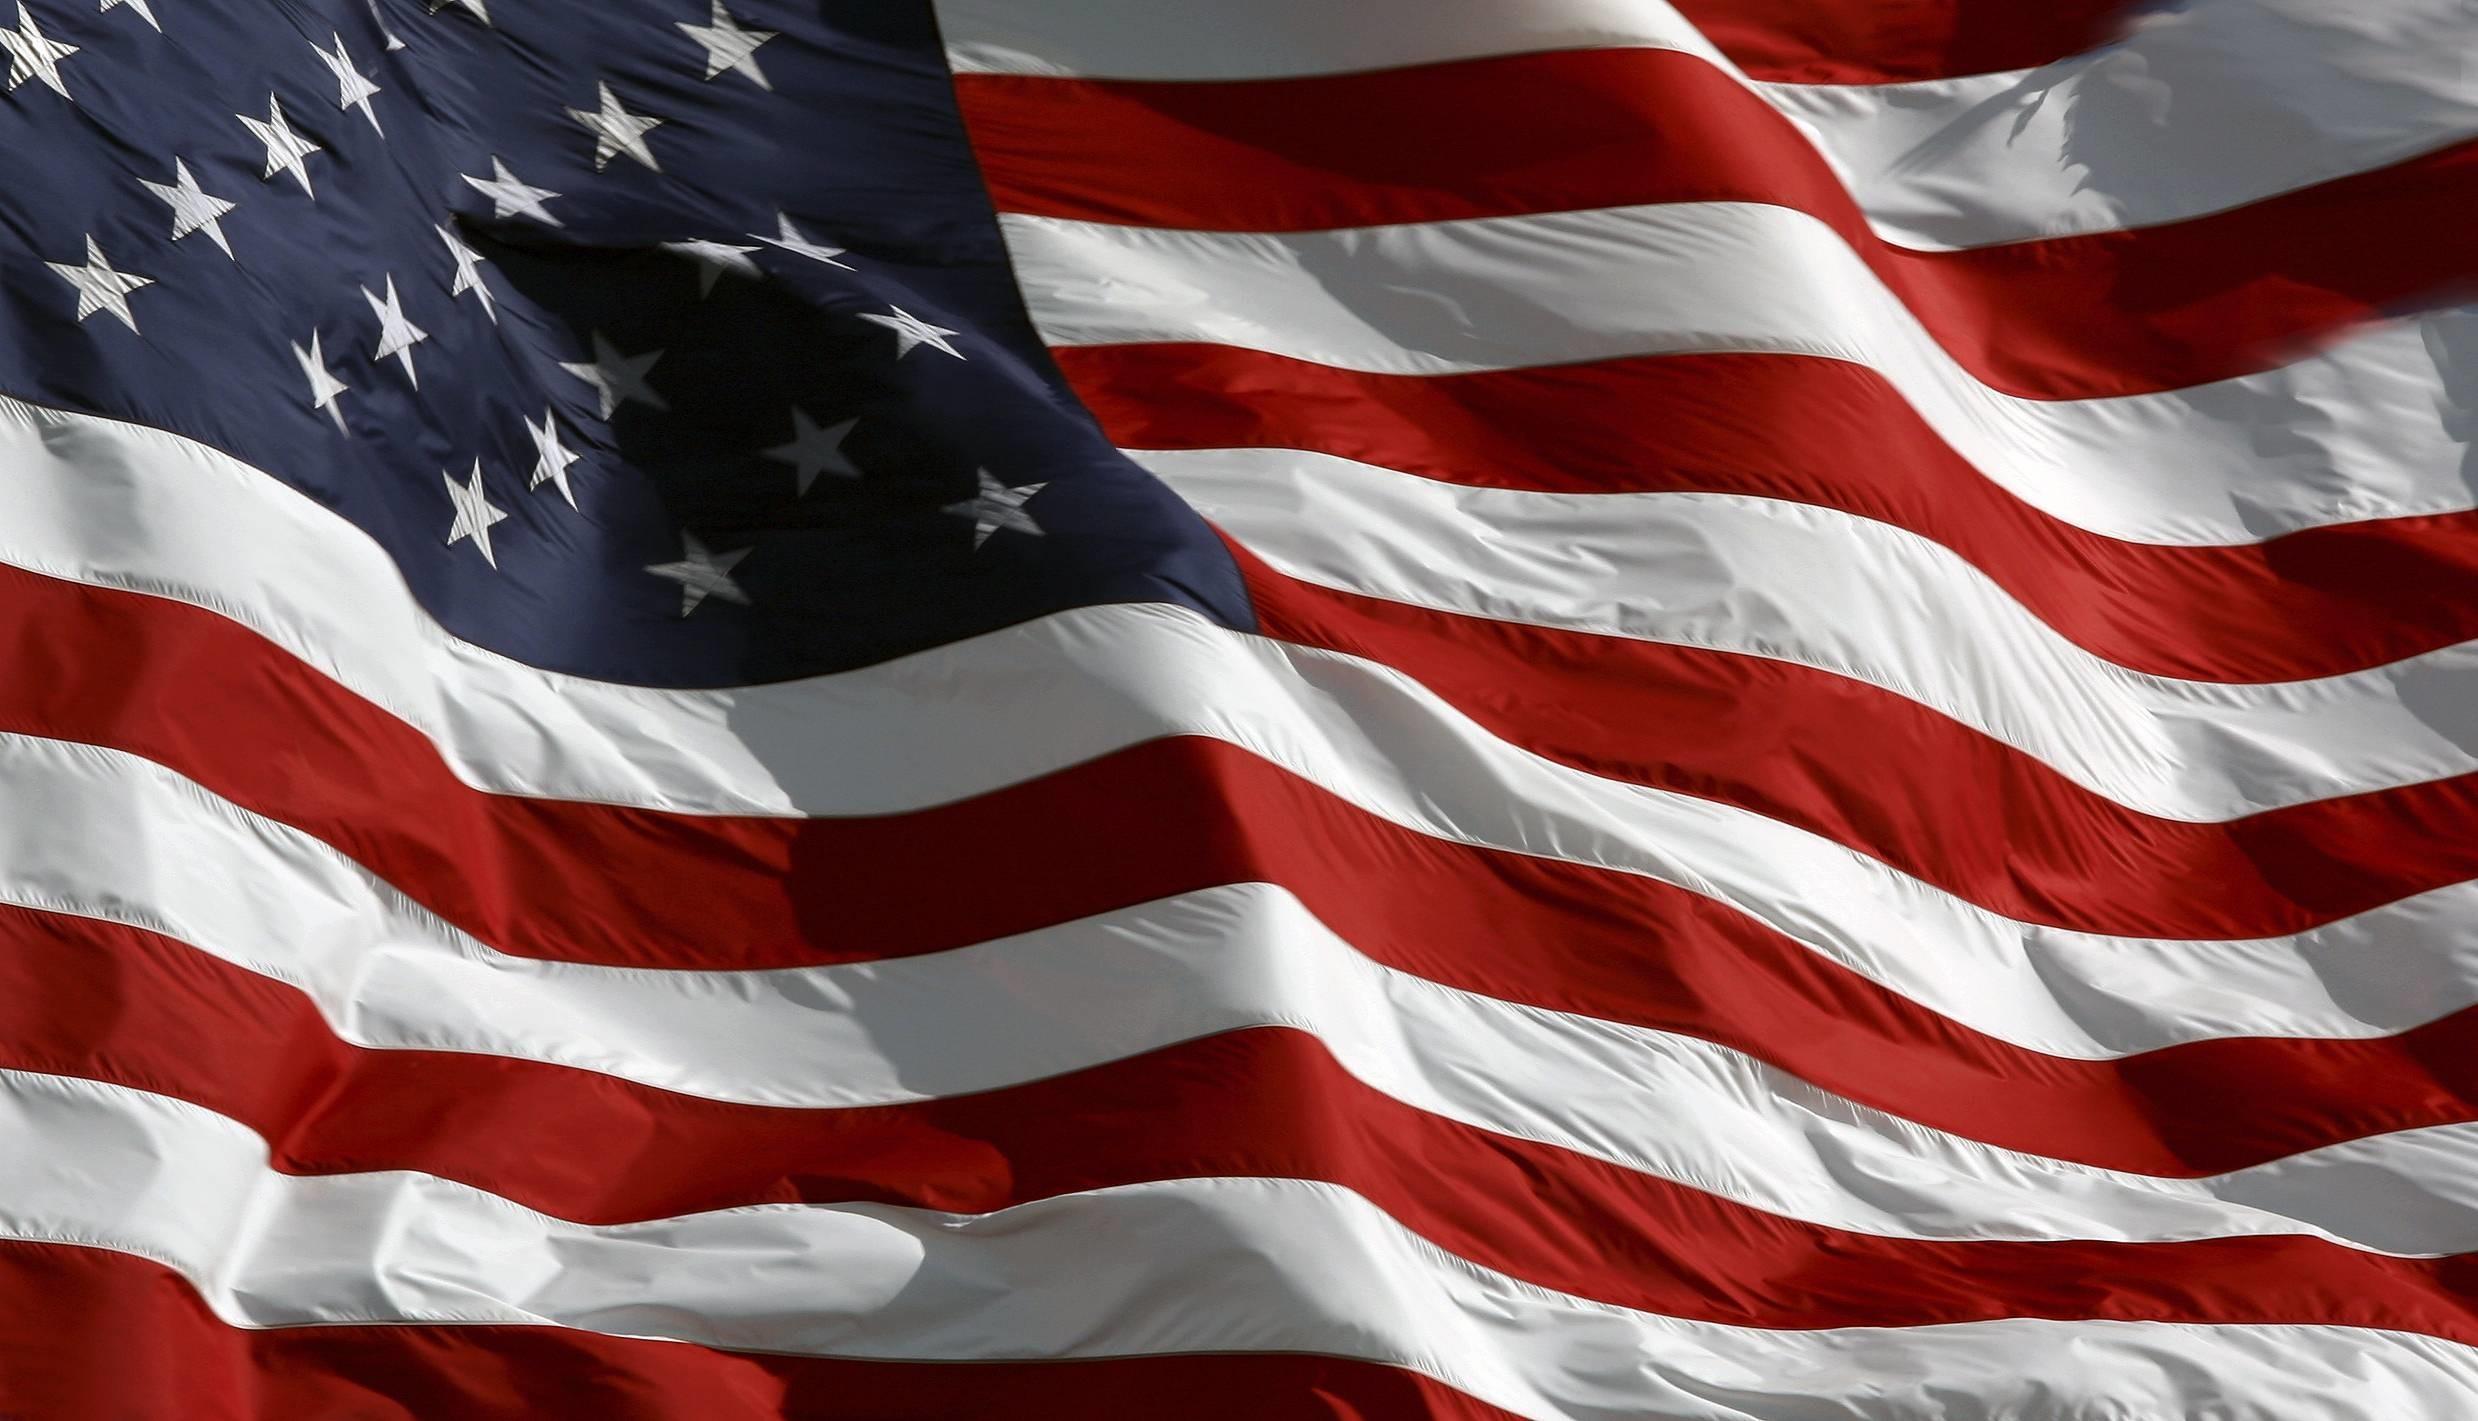 American Flag Background Wallpaper